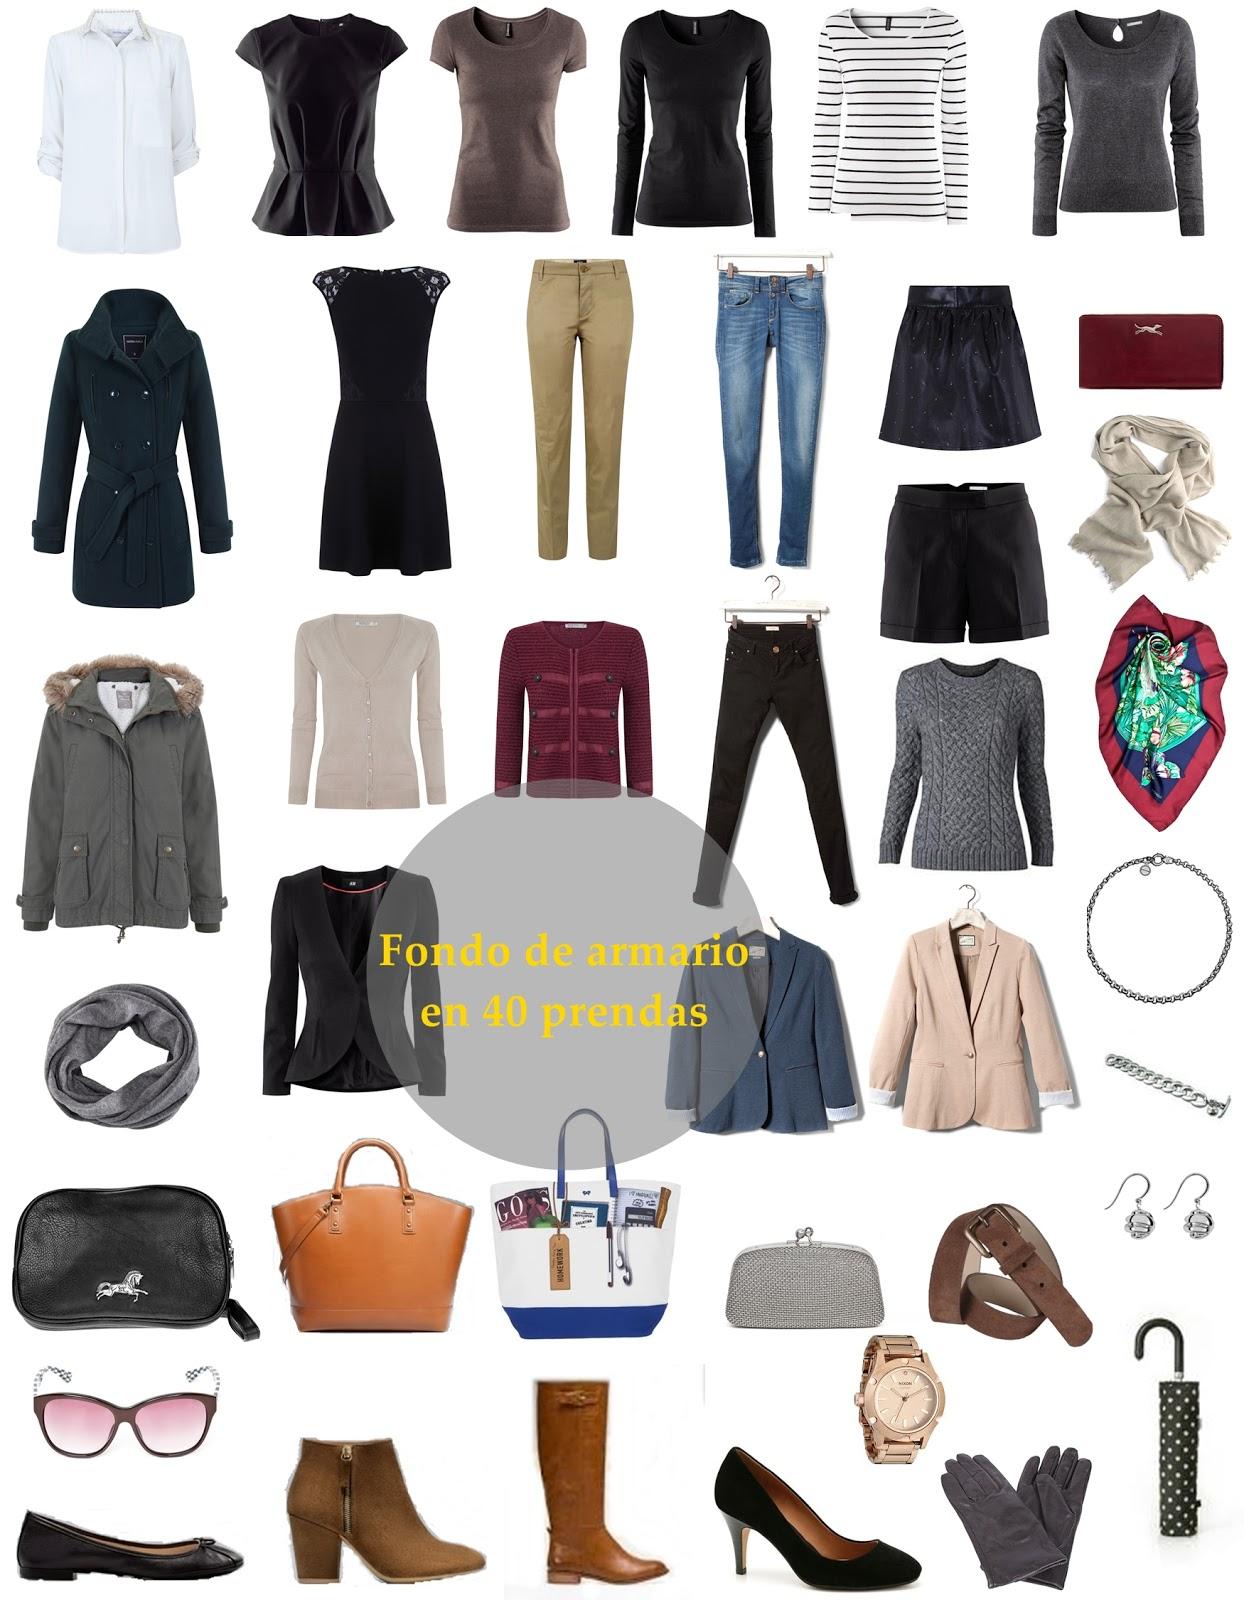 Como Fazer Artesanato Reciclagem De Garrafa Pet ~ Básicos armario on Pinterest Tie A Scarf, Zapatos and Vestidos